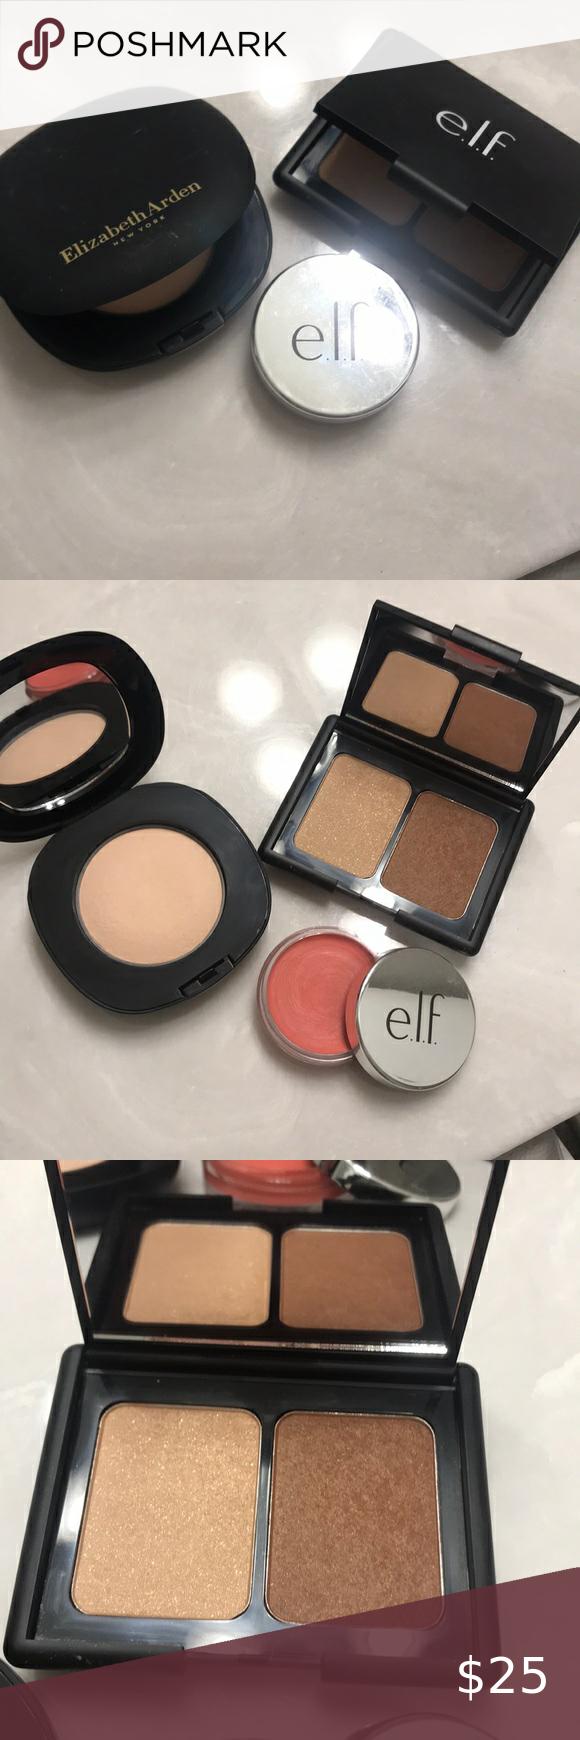 Makeup bundle! in 2020 Makeup bundles, Cream blush